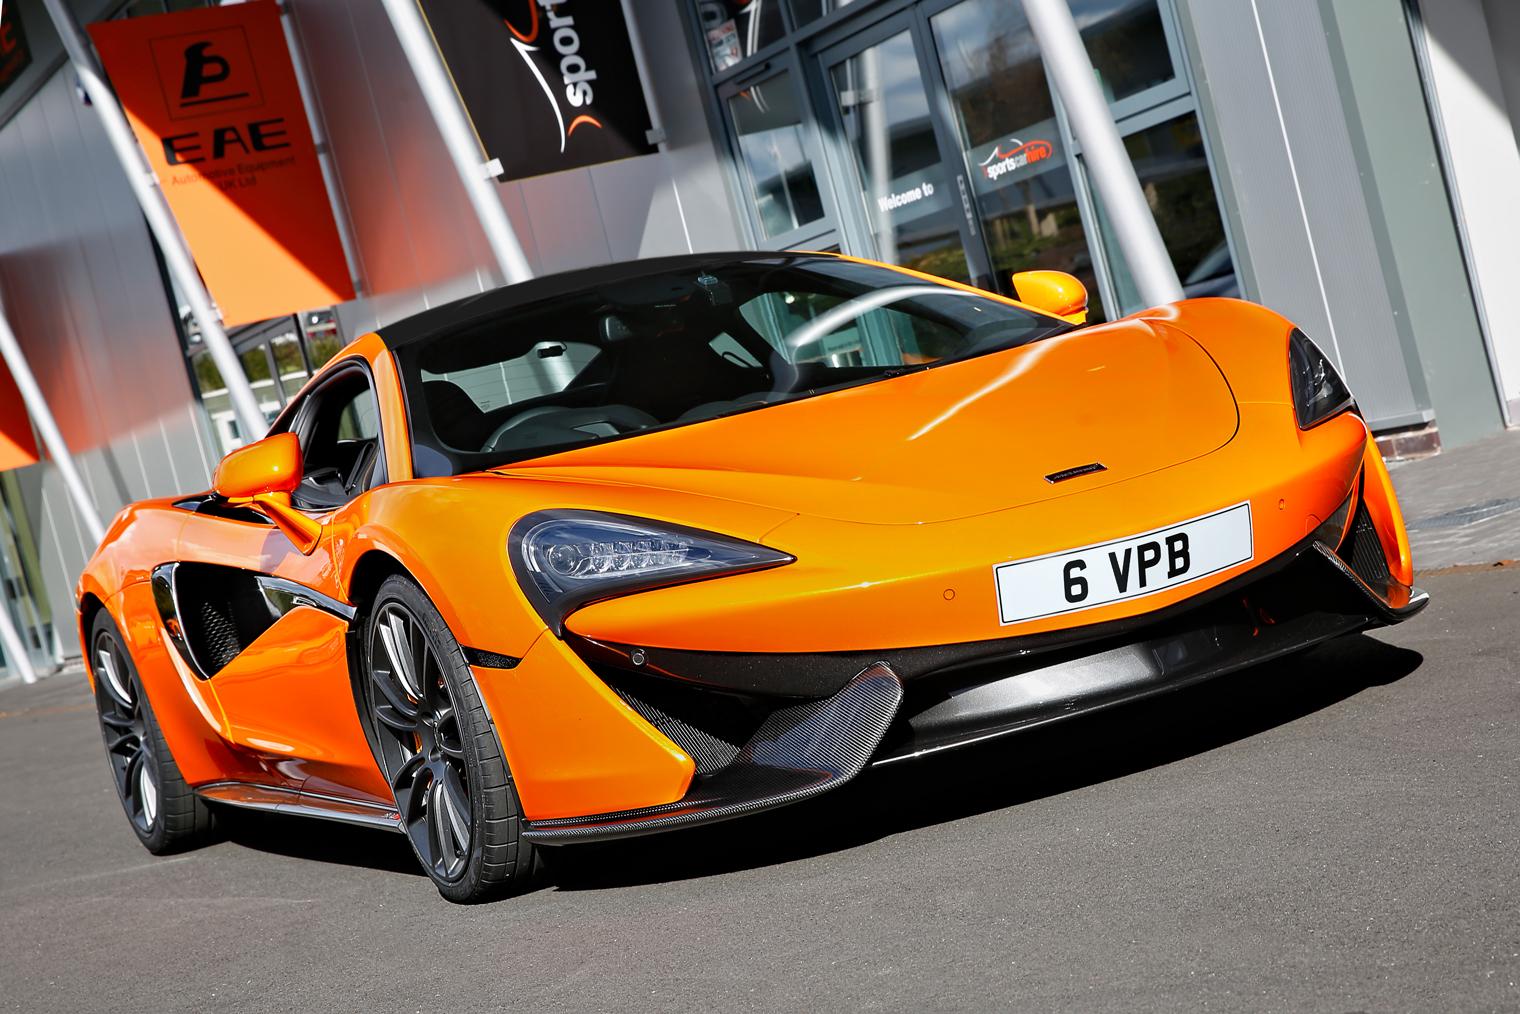 McLaren 570S for hire from Sportshire, Midlands